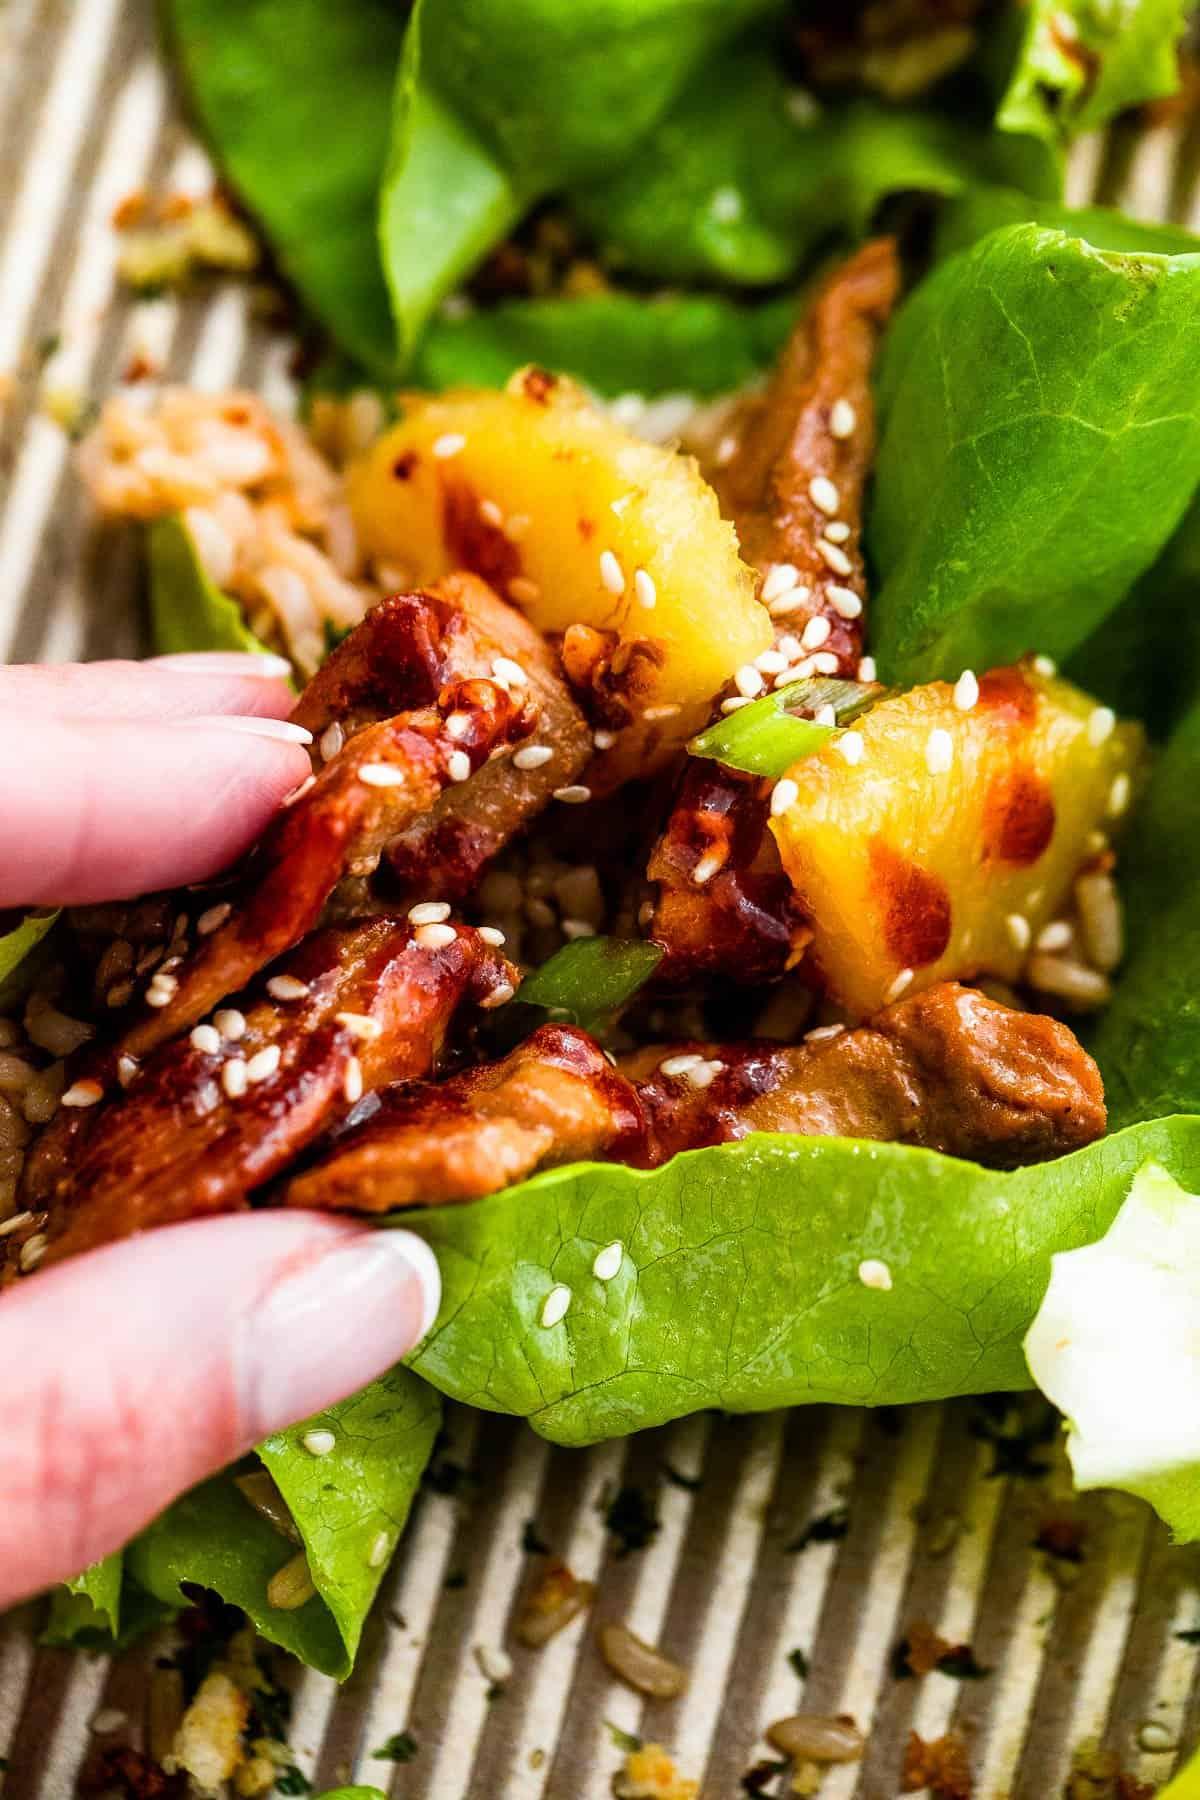 a hand grabbing a pork lettuce wrap